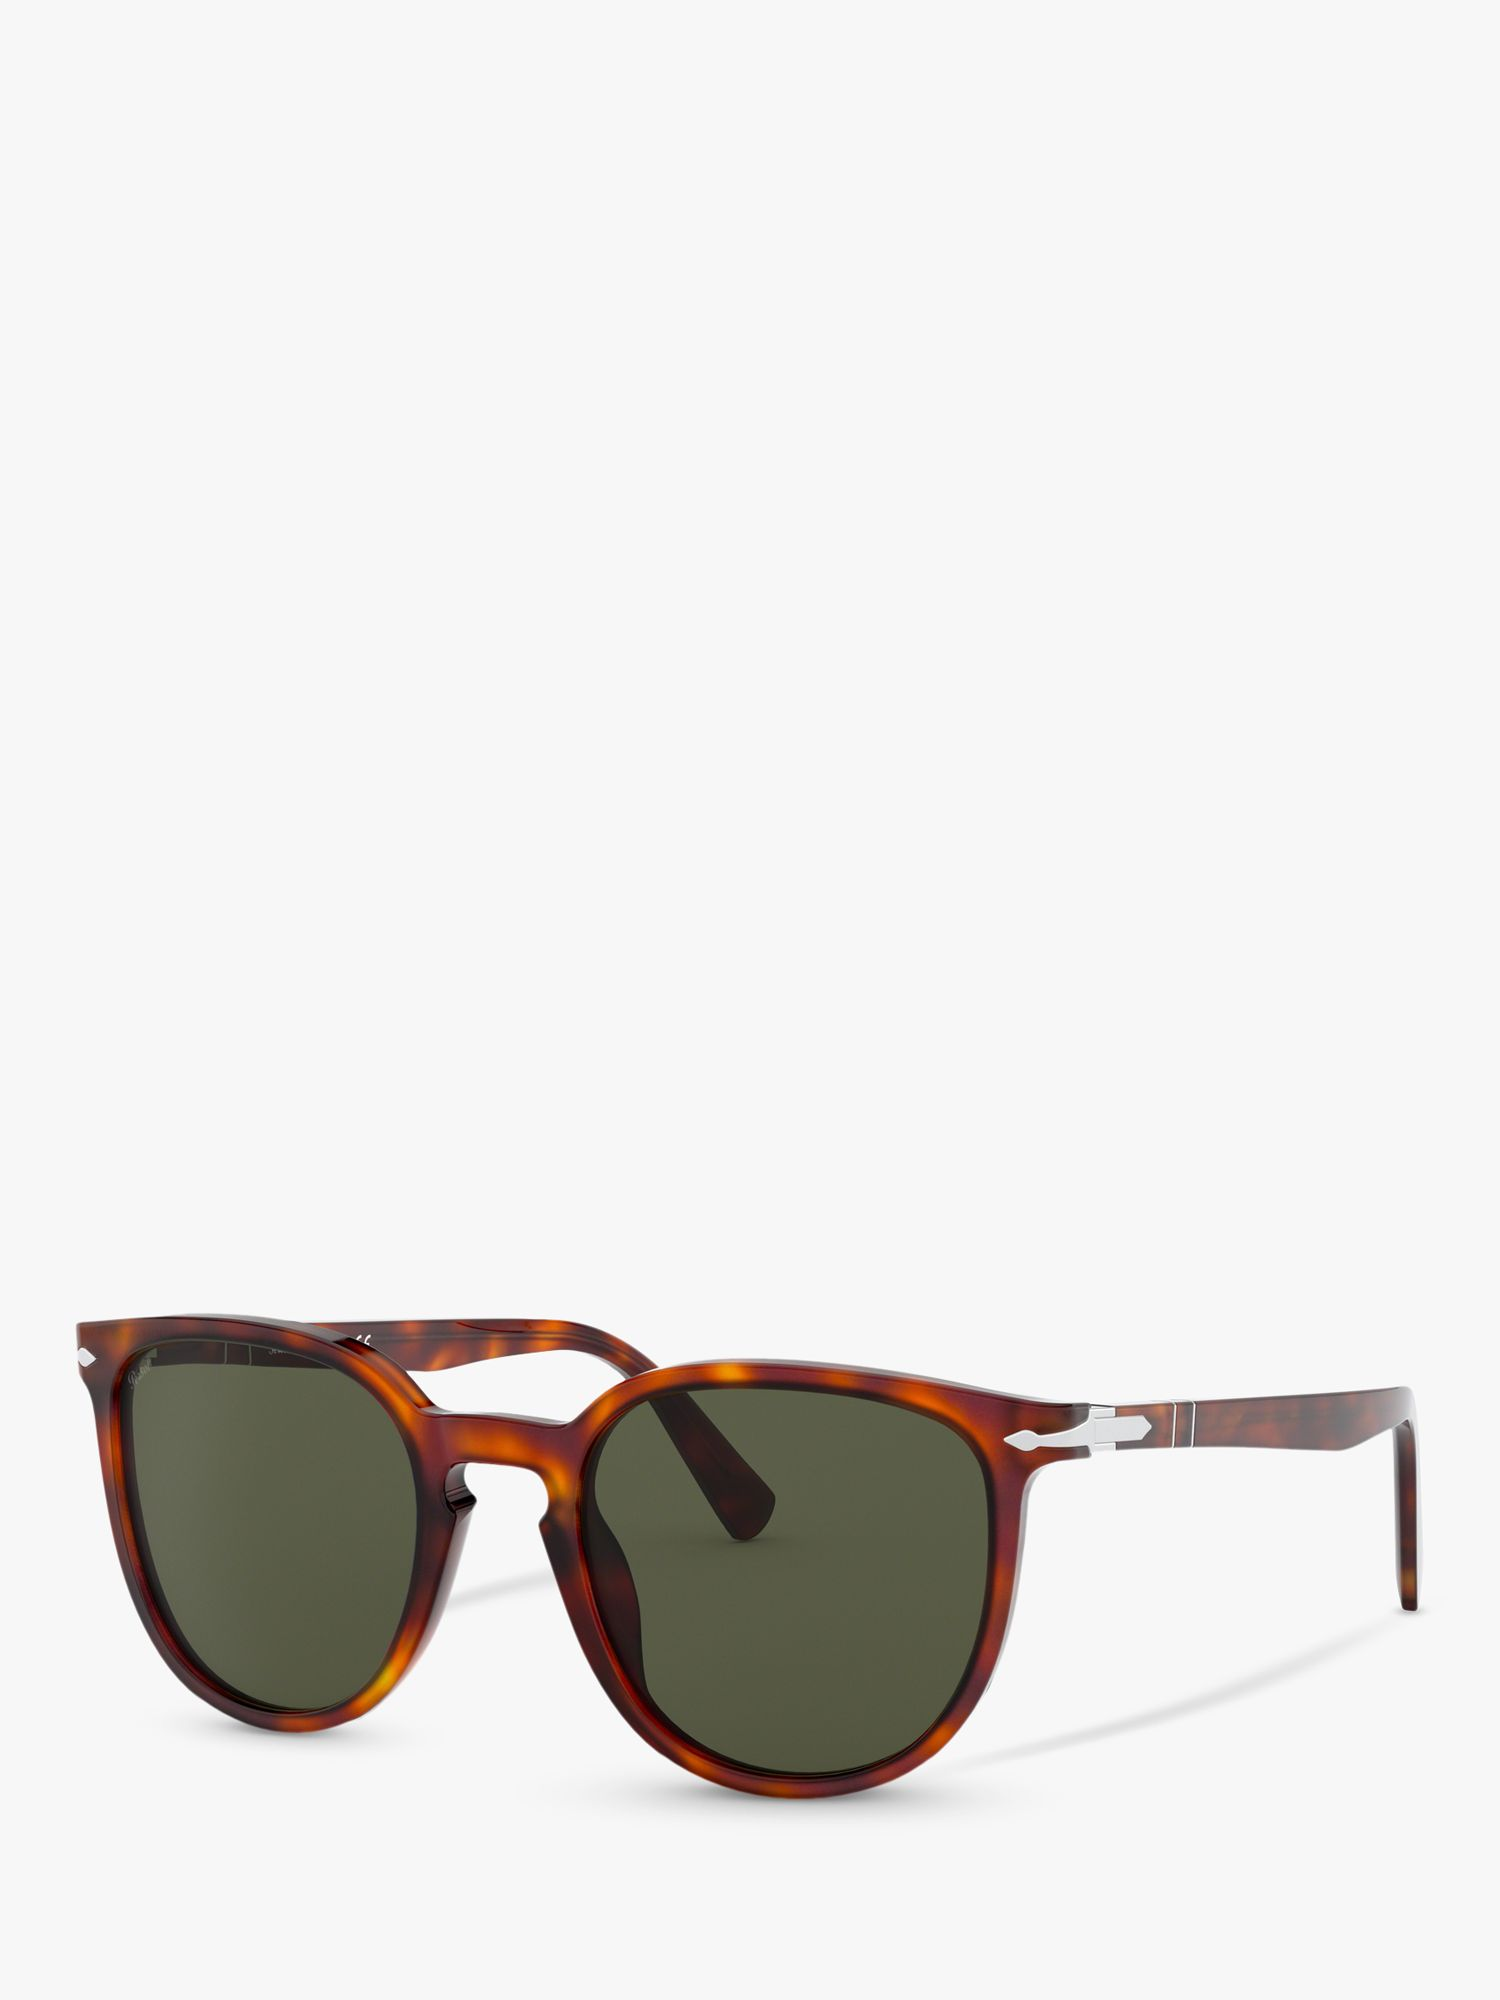 Persol Persol PO3226S Special Edition Oval Sunglasses, Havana/Green